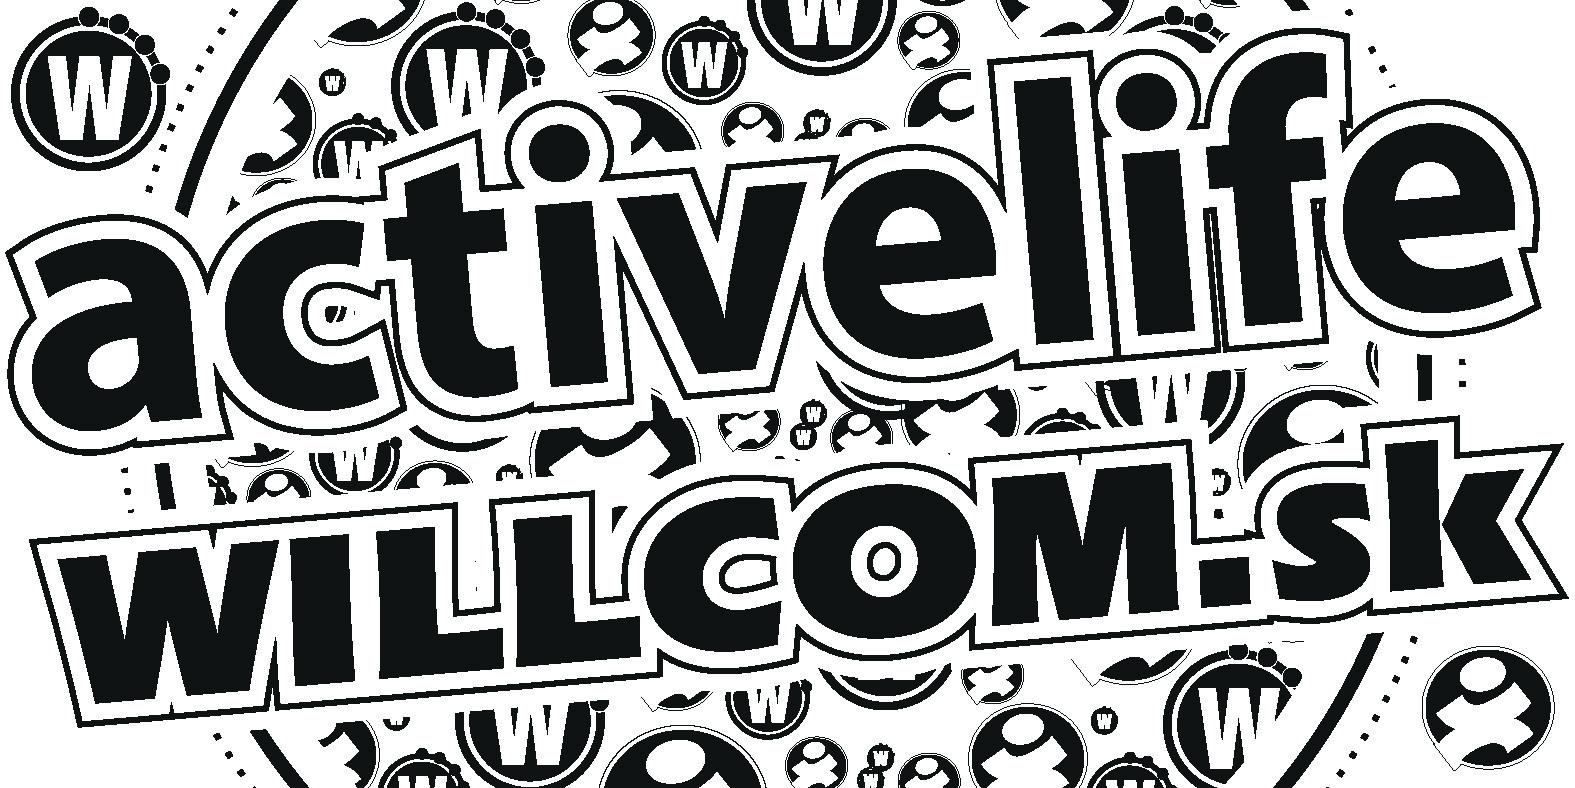 /images/com_odtatierkdunaju/teams/2021_Active-life---WILLCOM-sk.jpg